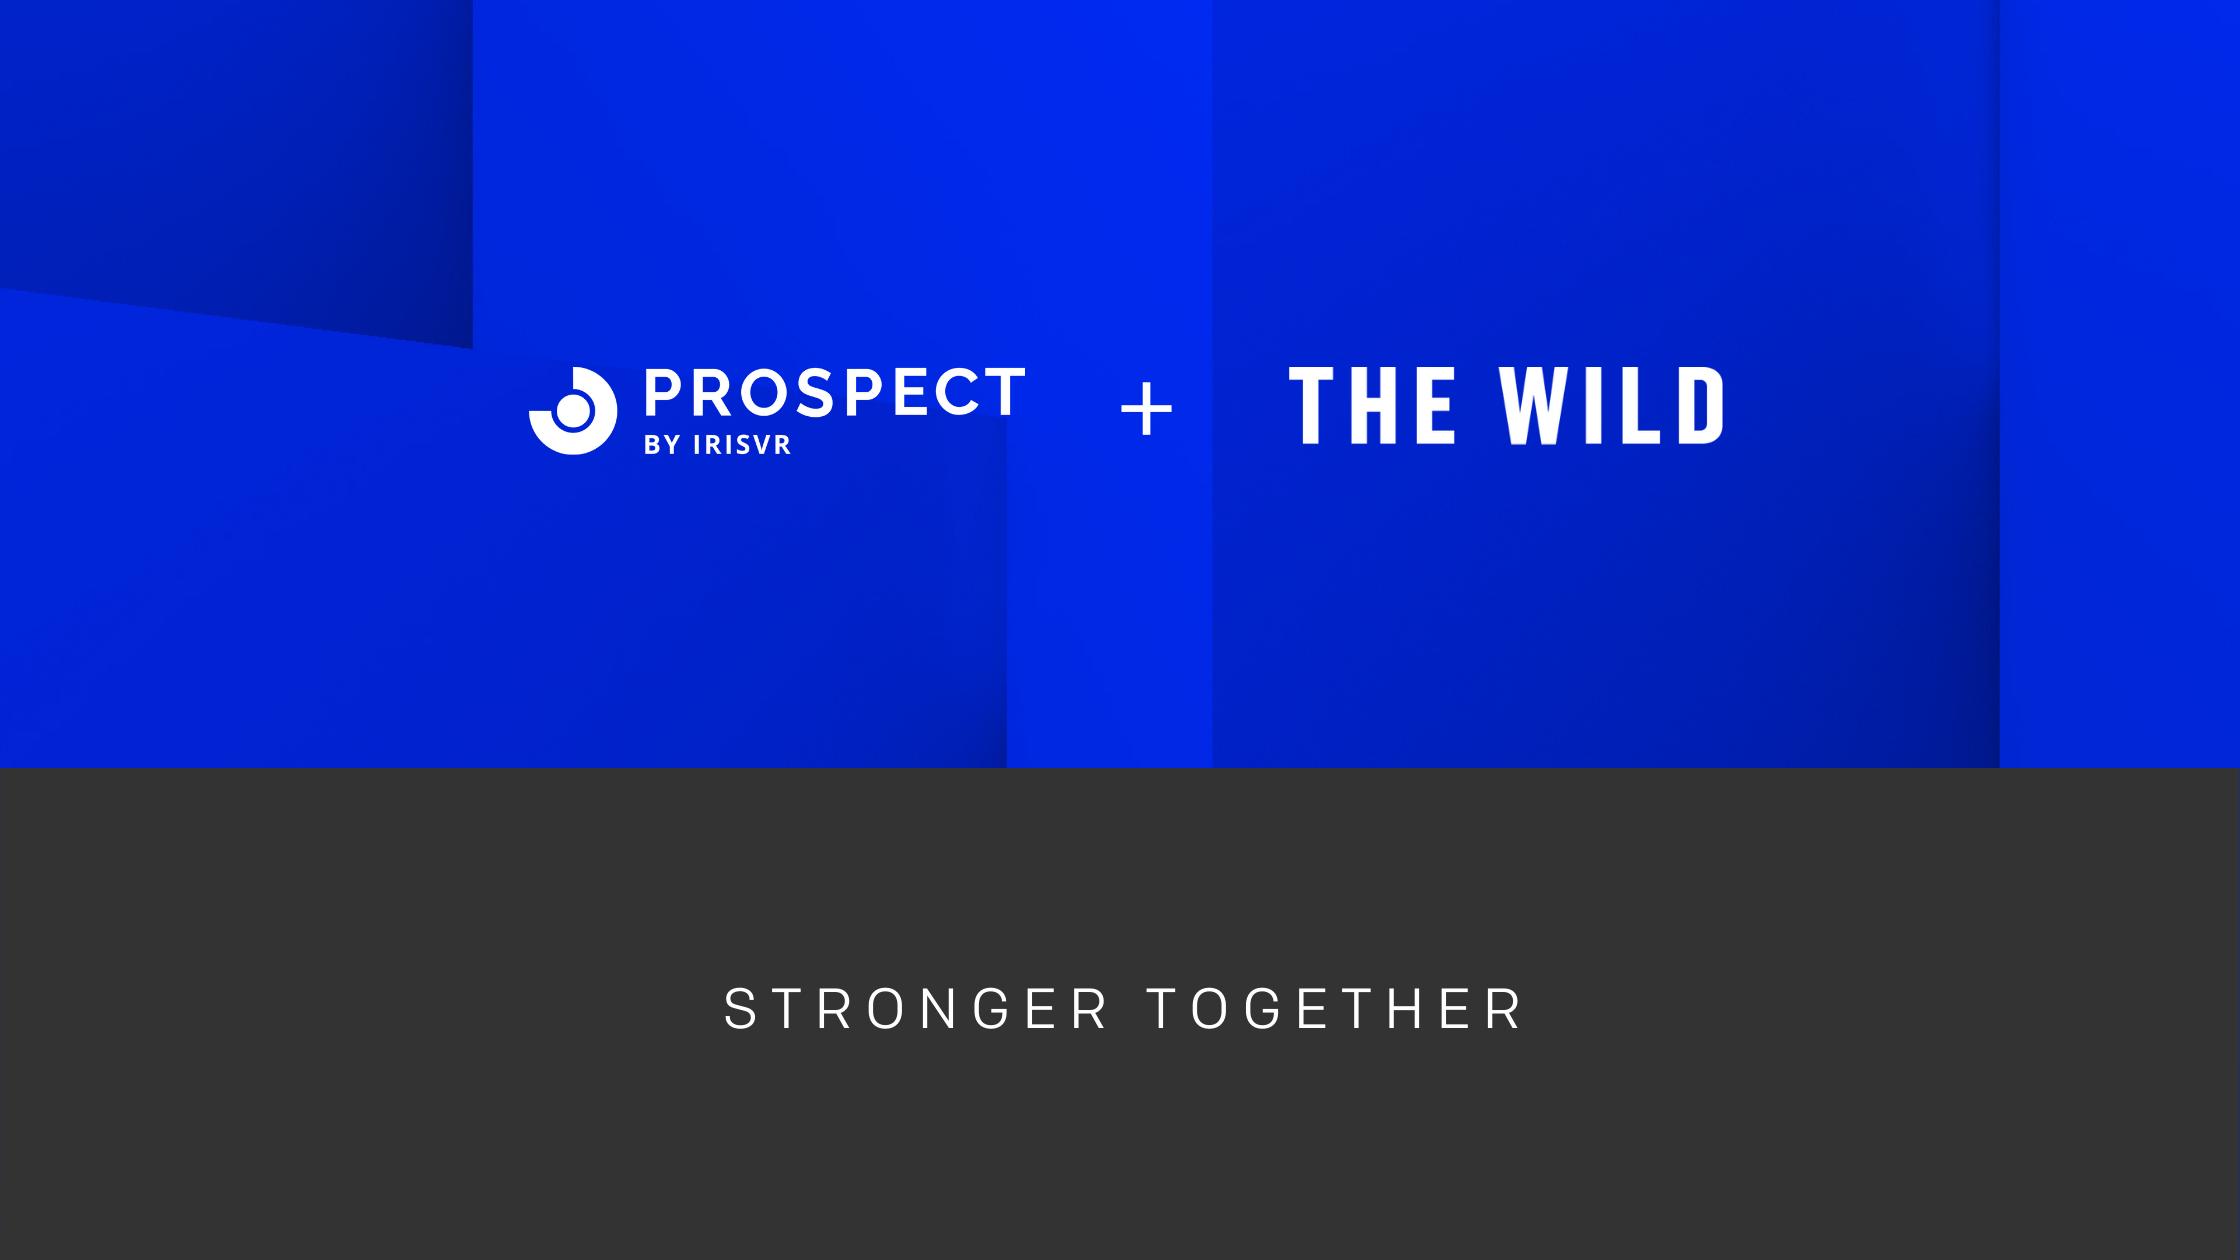 Prospect (IrisVR) joins The Wild